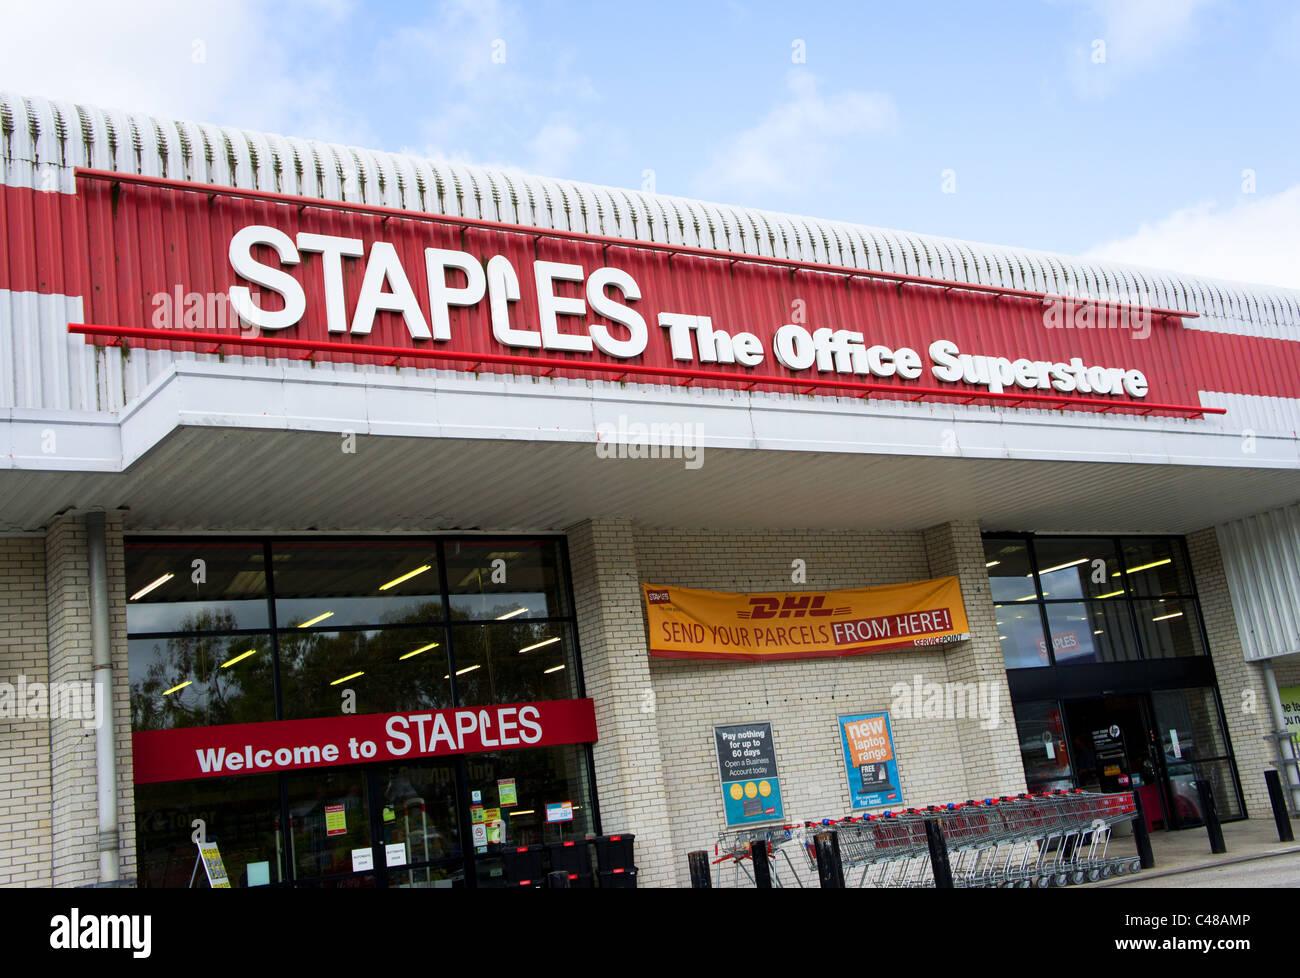 Staples store - Stock Image